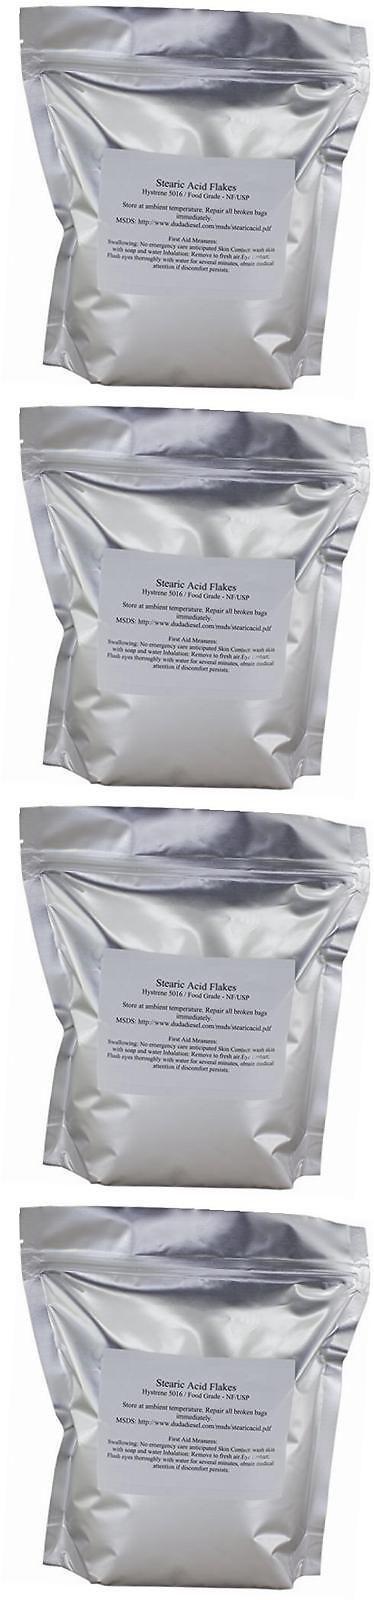 Hyaluronic Acid Serum by Skin_Deva #21